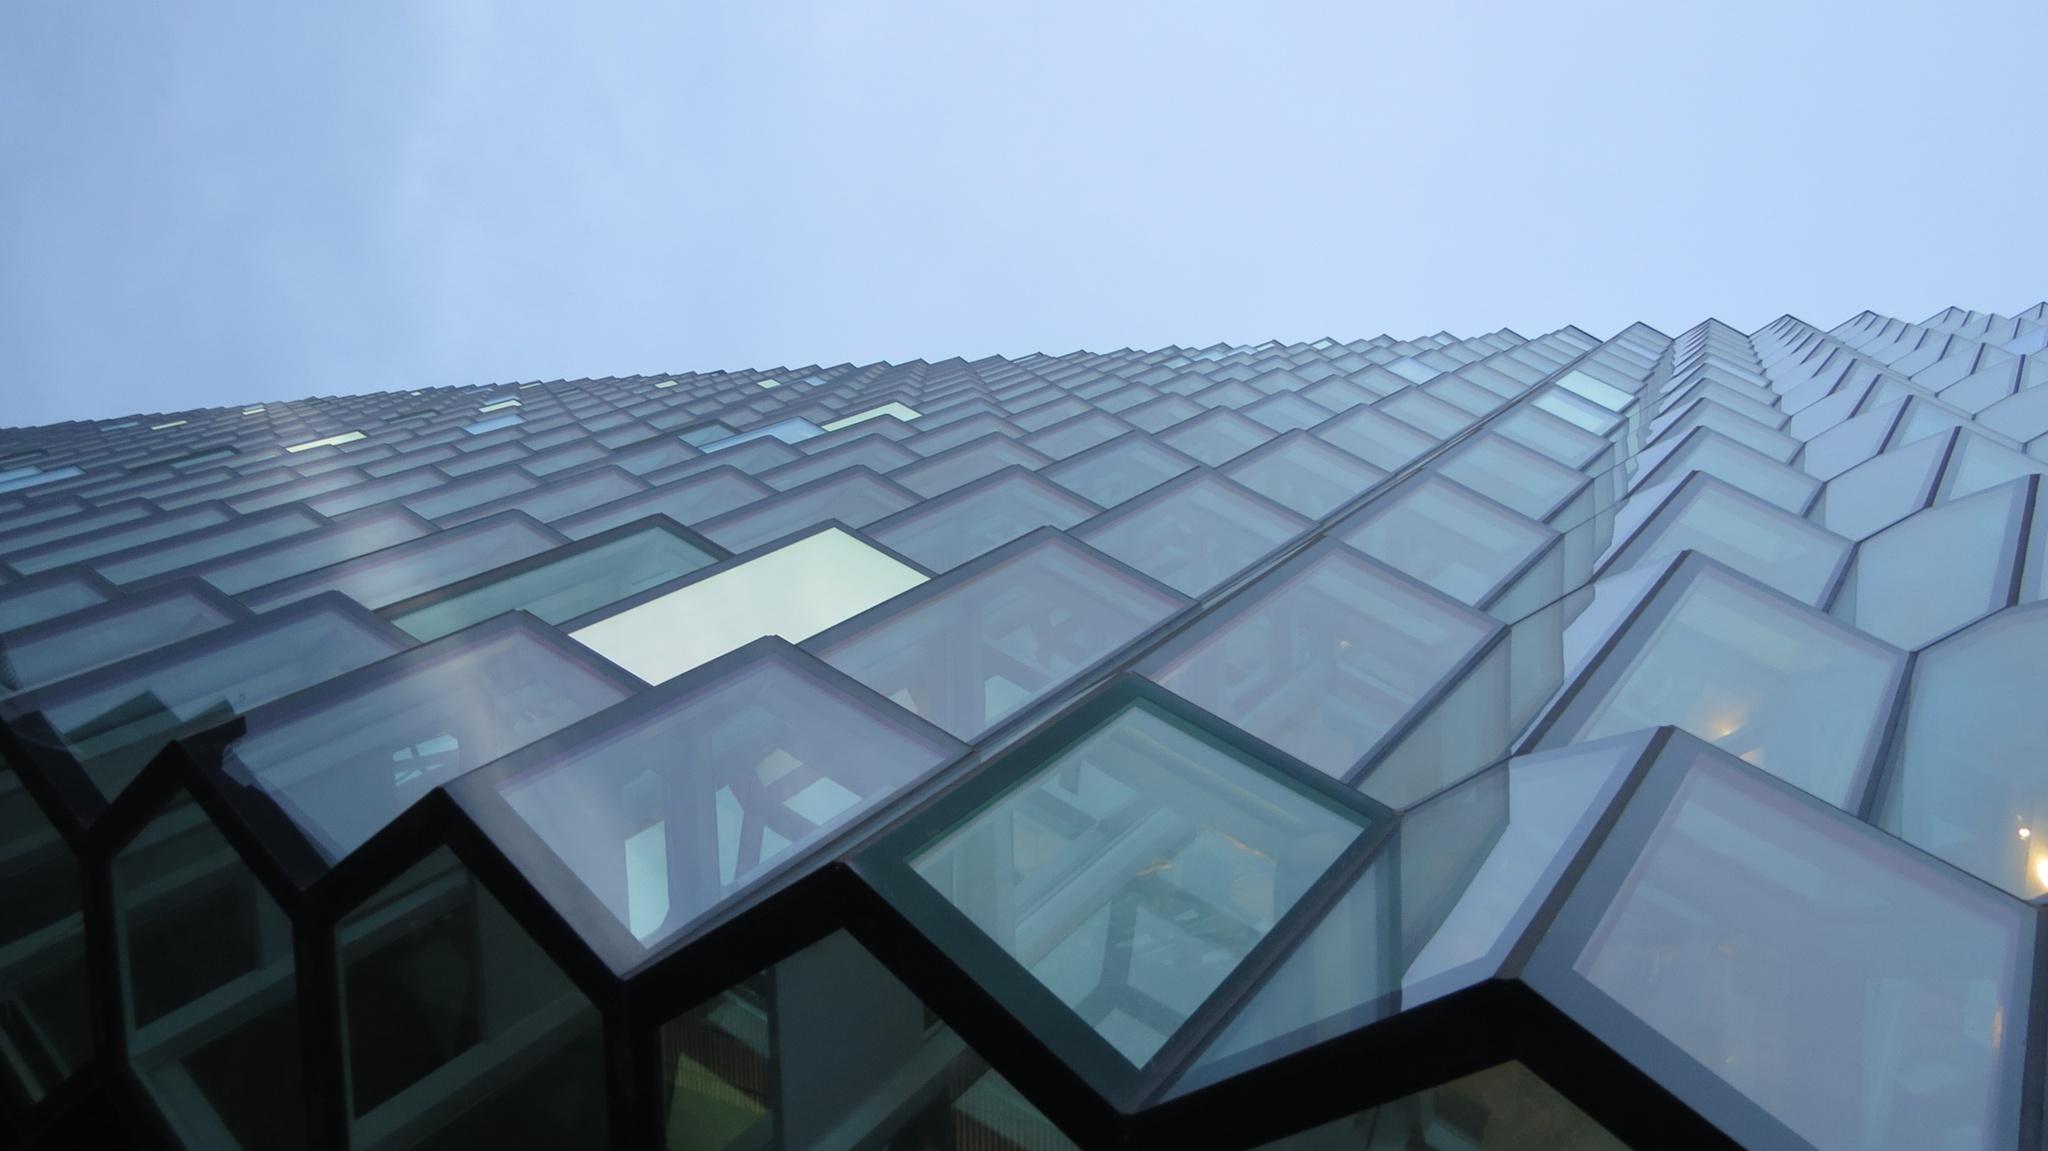 Reykjavik opera house by Davie Butler